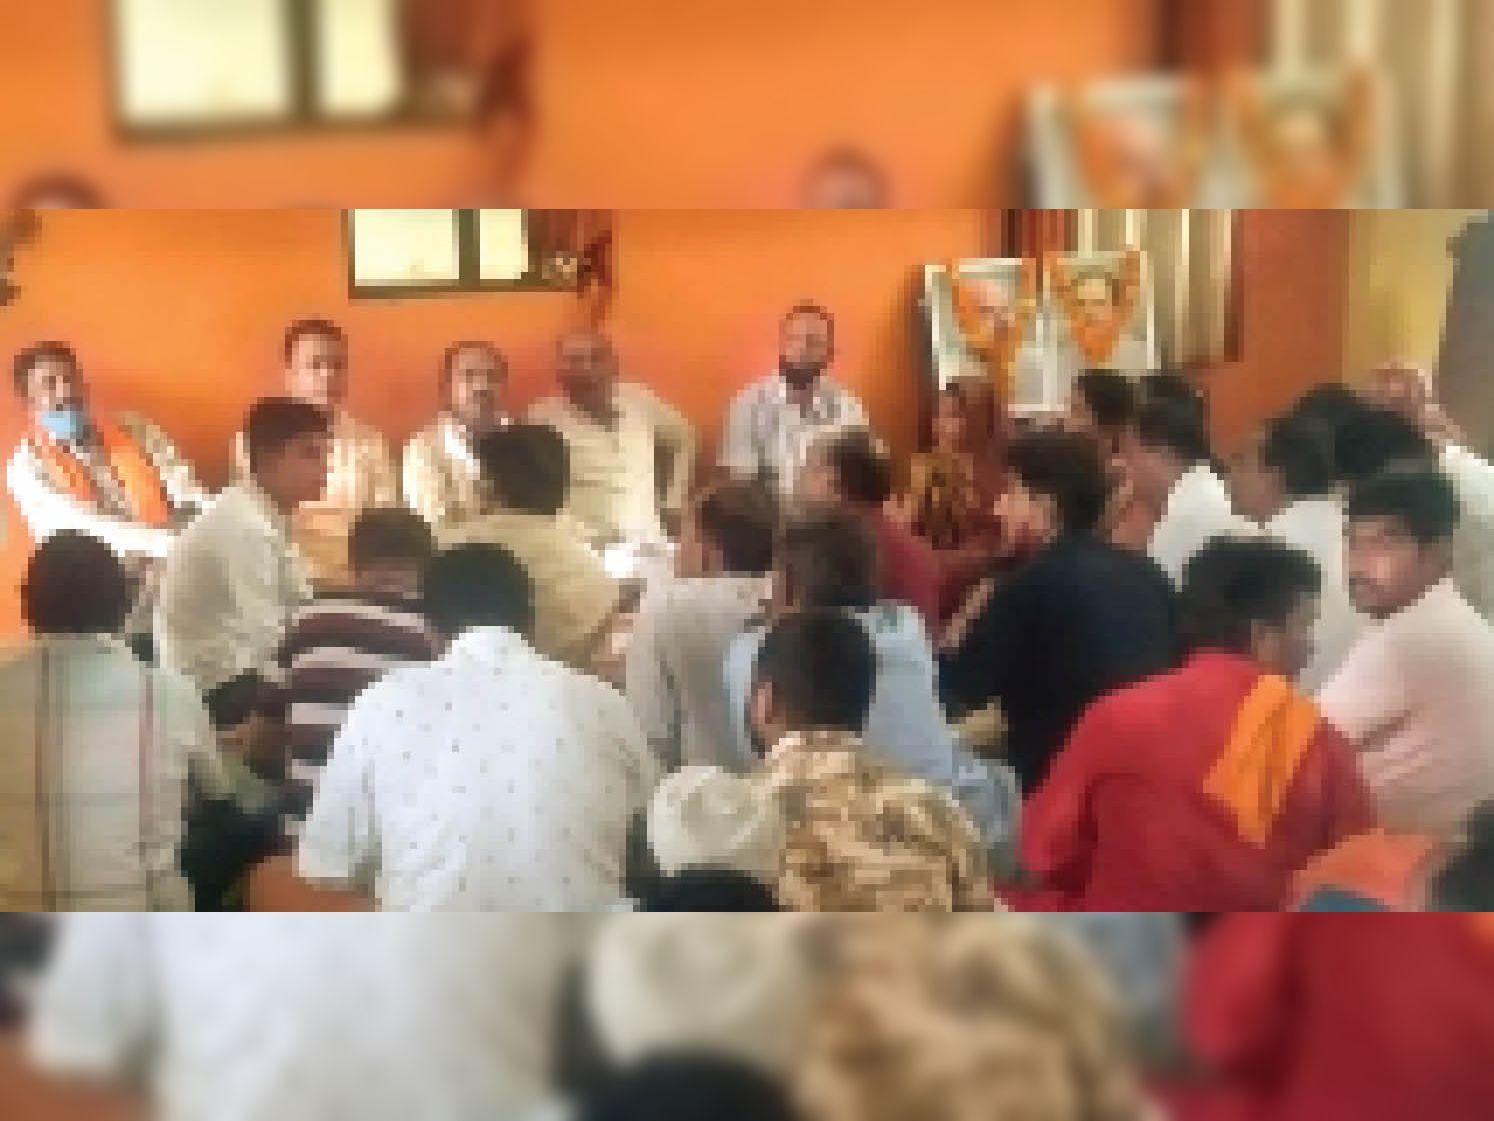 मंडल स्तरीय बैठक में शामिल भाजपा पदाधिकारी व कार्यकर्ता। - Dainik Bhaskar